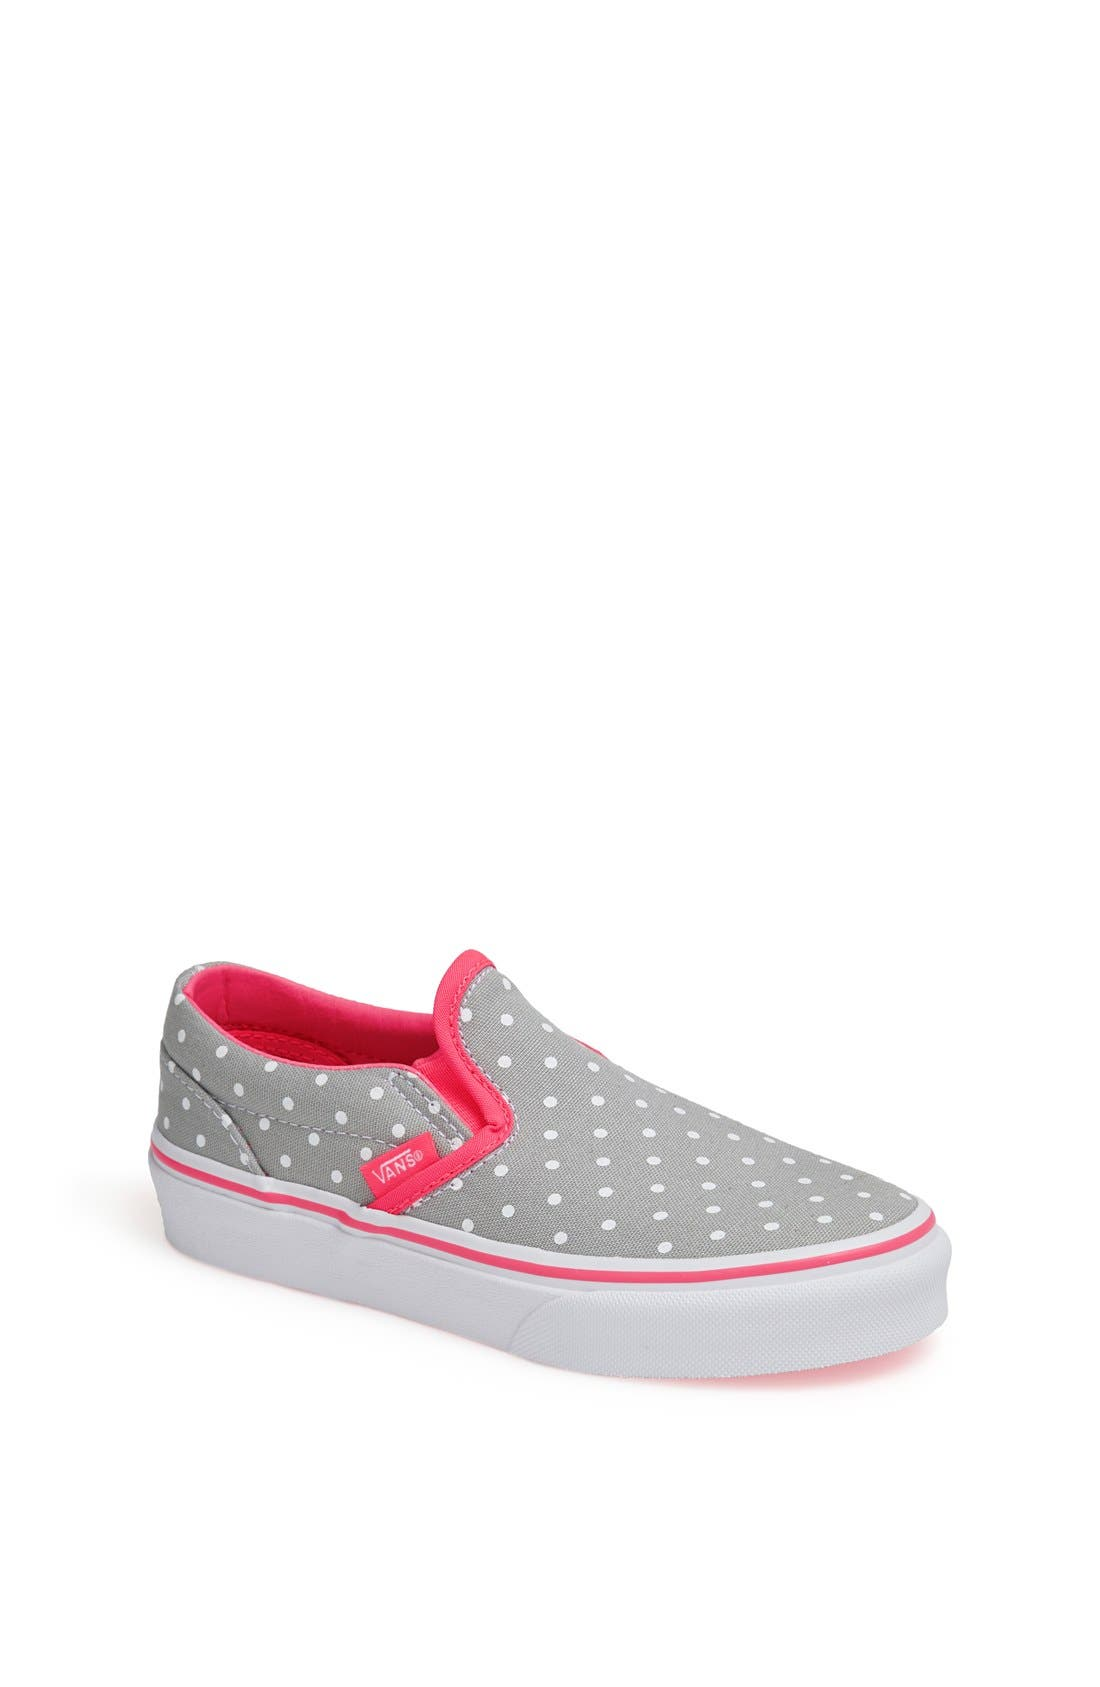 Alternate Image 1 Selected - Vans Slip-On Sneaker (Toddler, Little Kid & Big Kid)